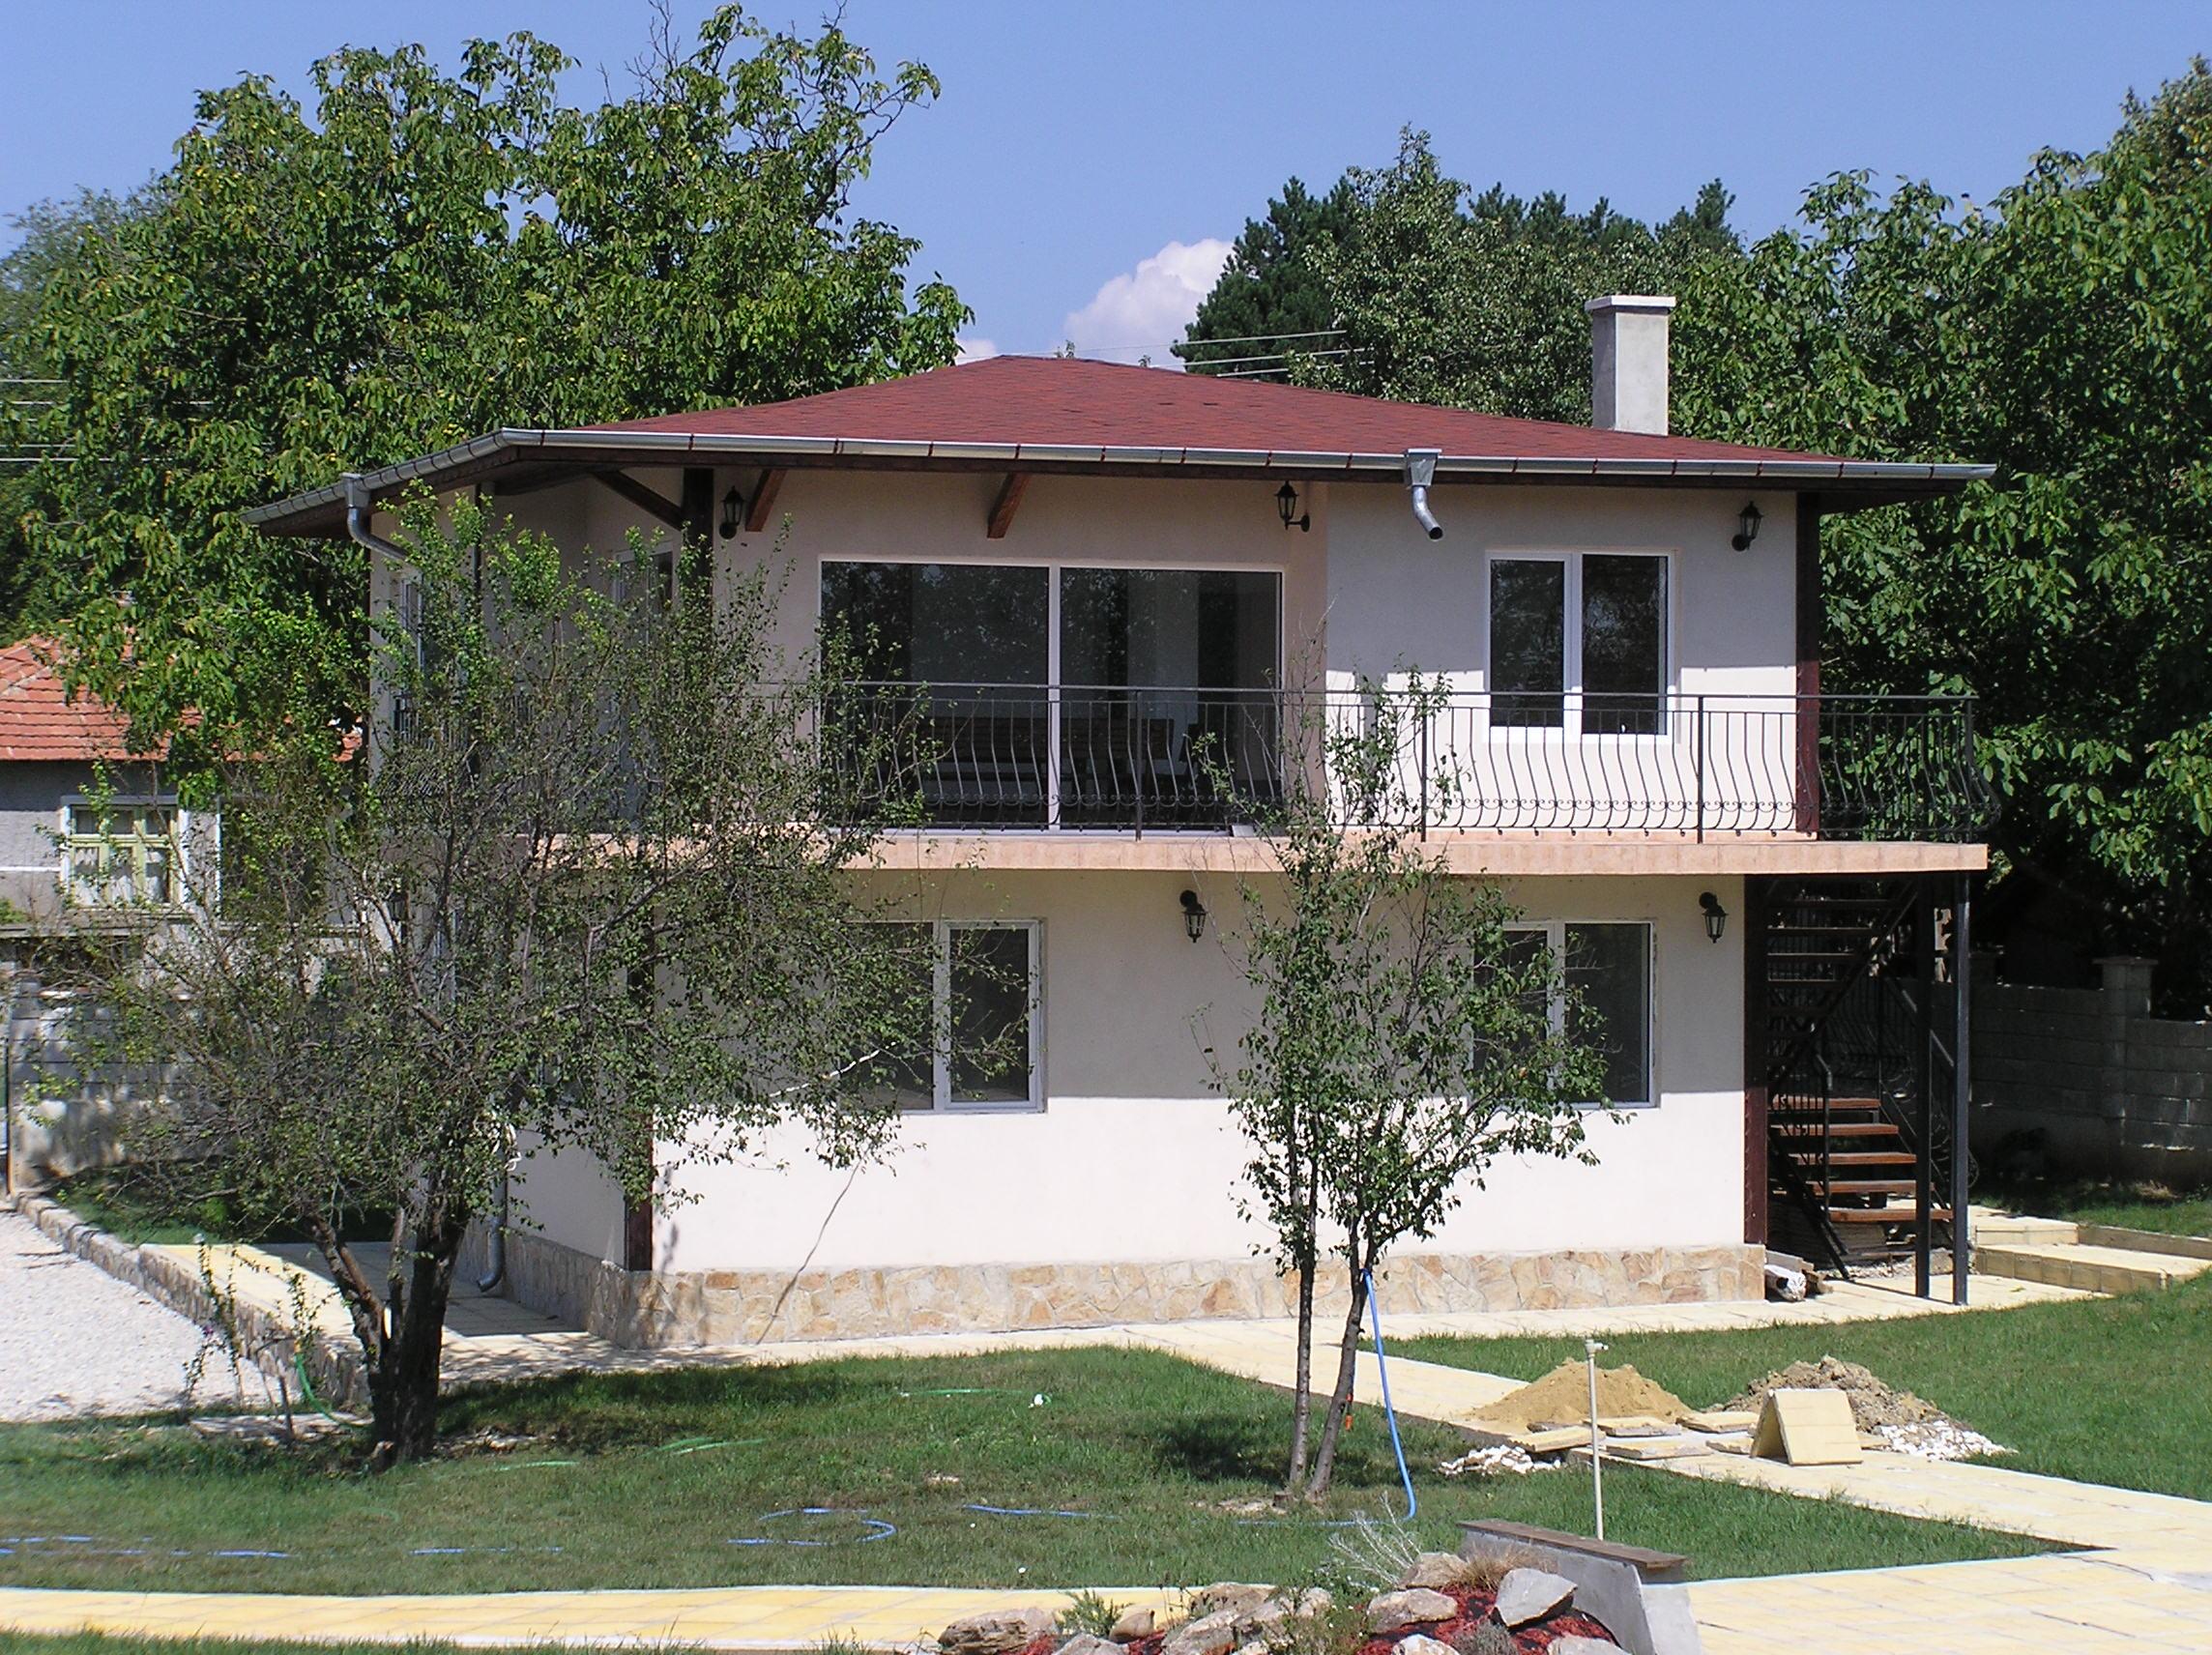 THE PERFECT PLOT FOR YOUR DREAM HOUSE ON THE SANDY BULGARIAN BEACHES NEAR VARNA